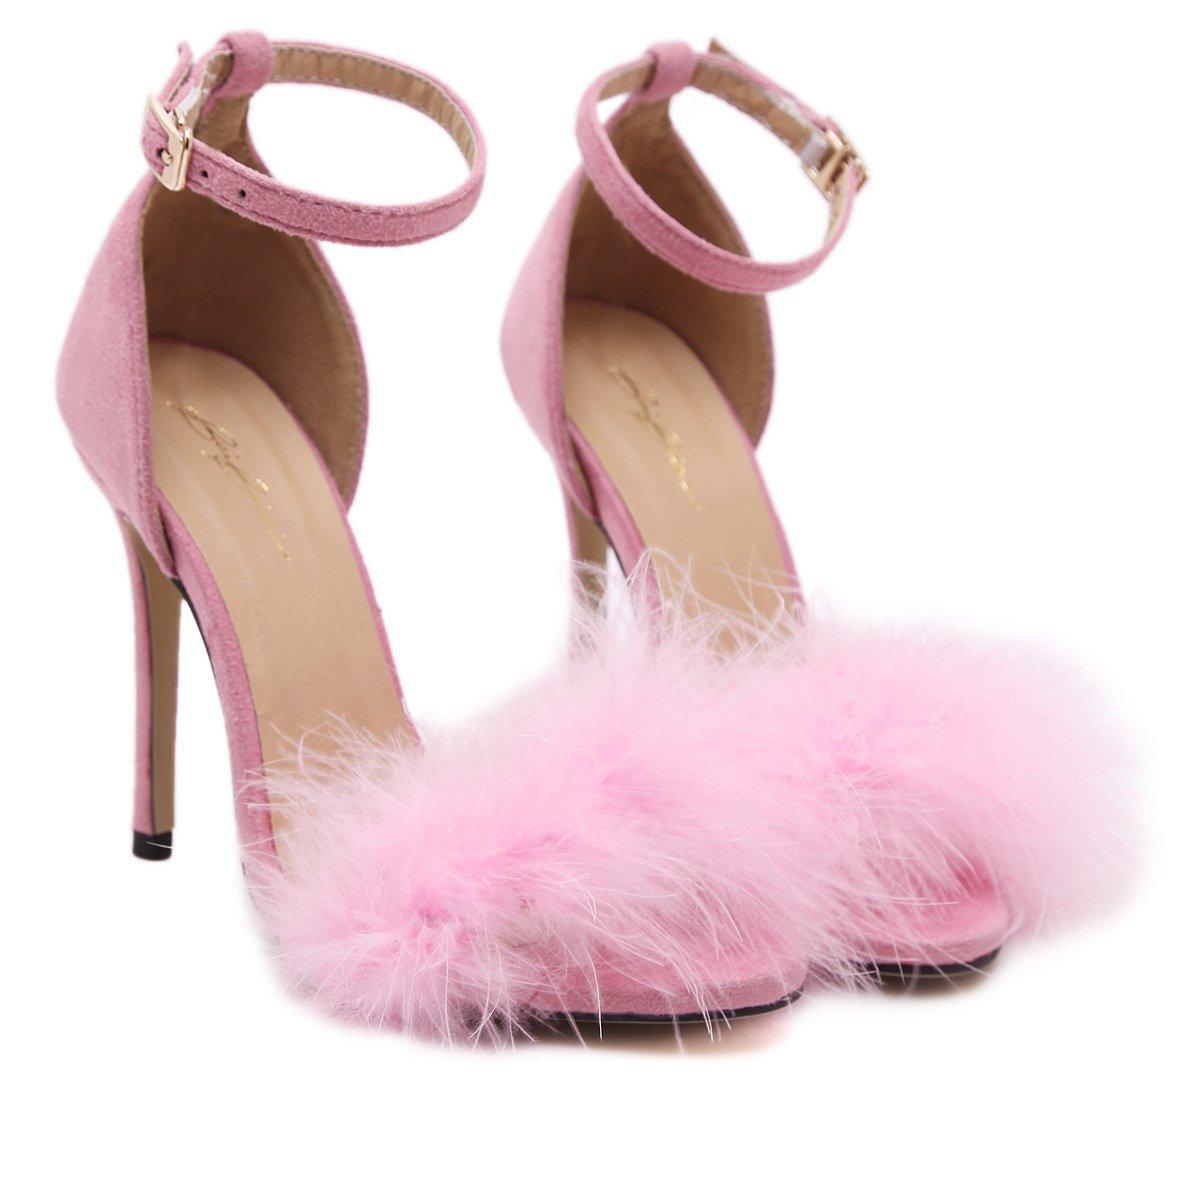 RUGAI-UE Damen Damen Damen High Heel Schuhe Sommer europäischen und amerikanischen Mode Schuhe Zehen High Heels und Damenschuhe. cf9b8d